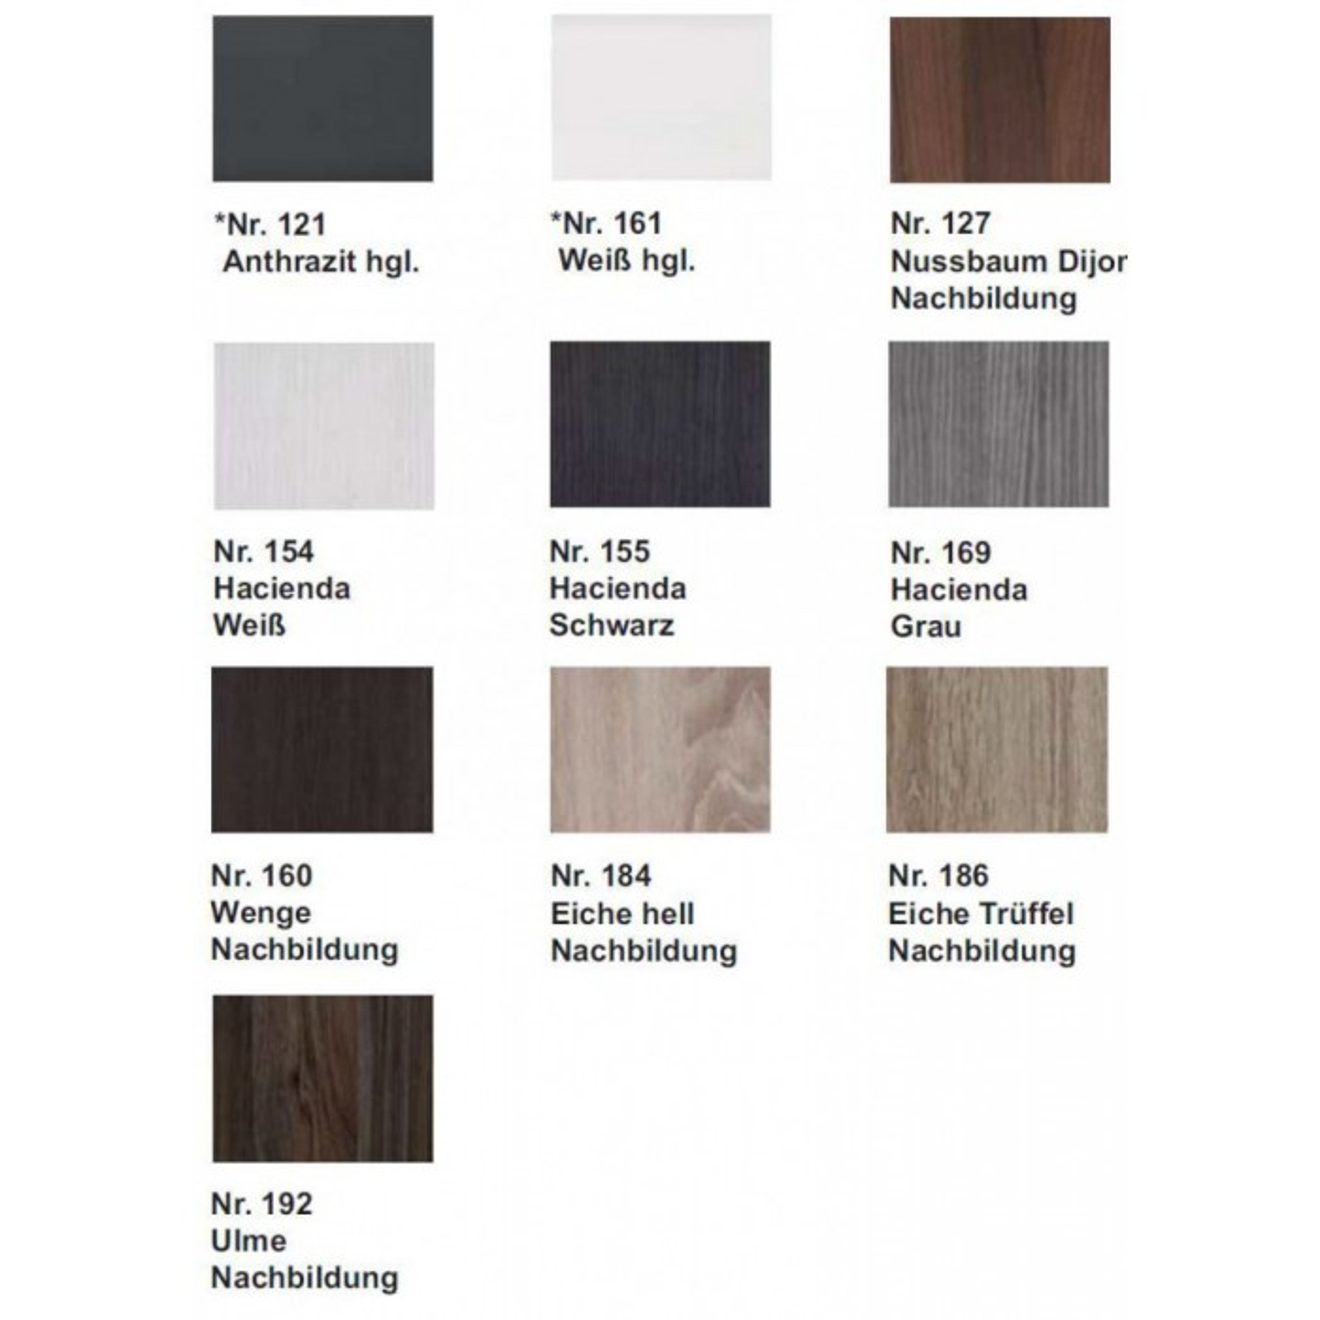 aufbauleuchte led bad kx14 hitoiro. Black Bedroom Furniture Sets. Home Design Ideas